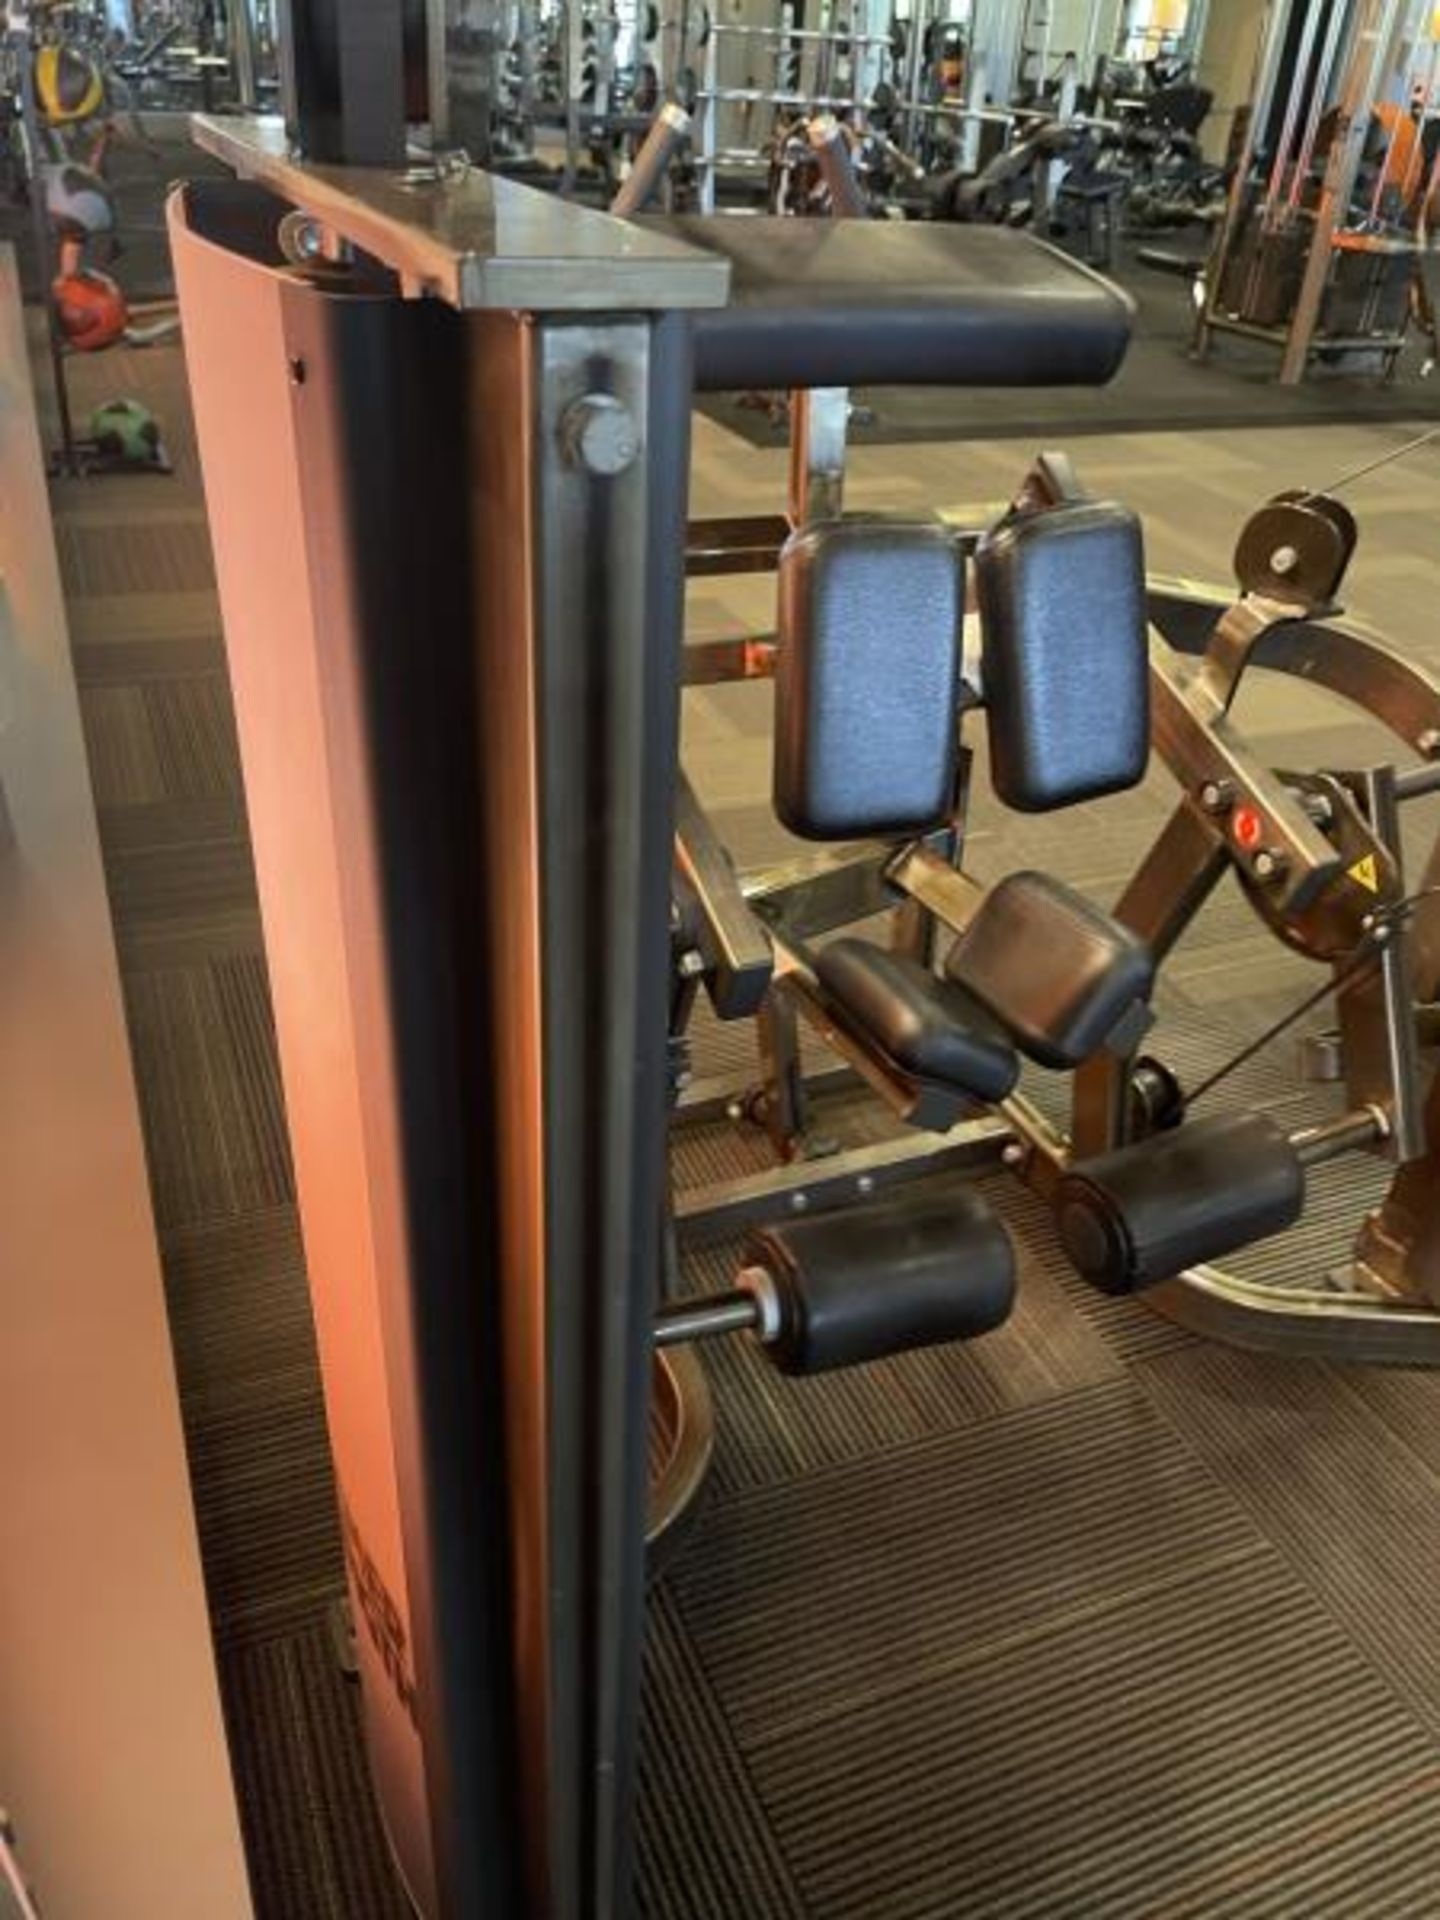 Hammer Strength MIS Kneeling Leg Curl M: MTSKC - Image 3 of 5